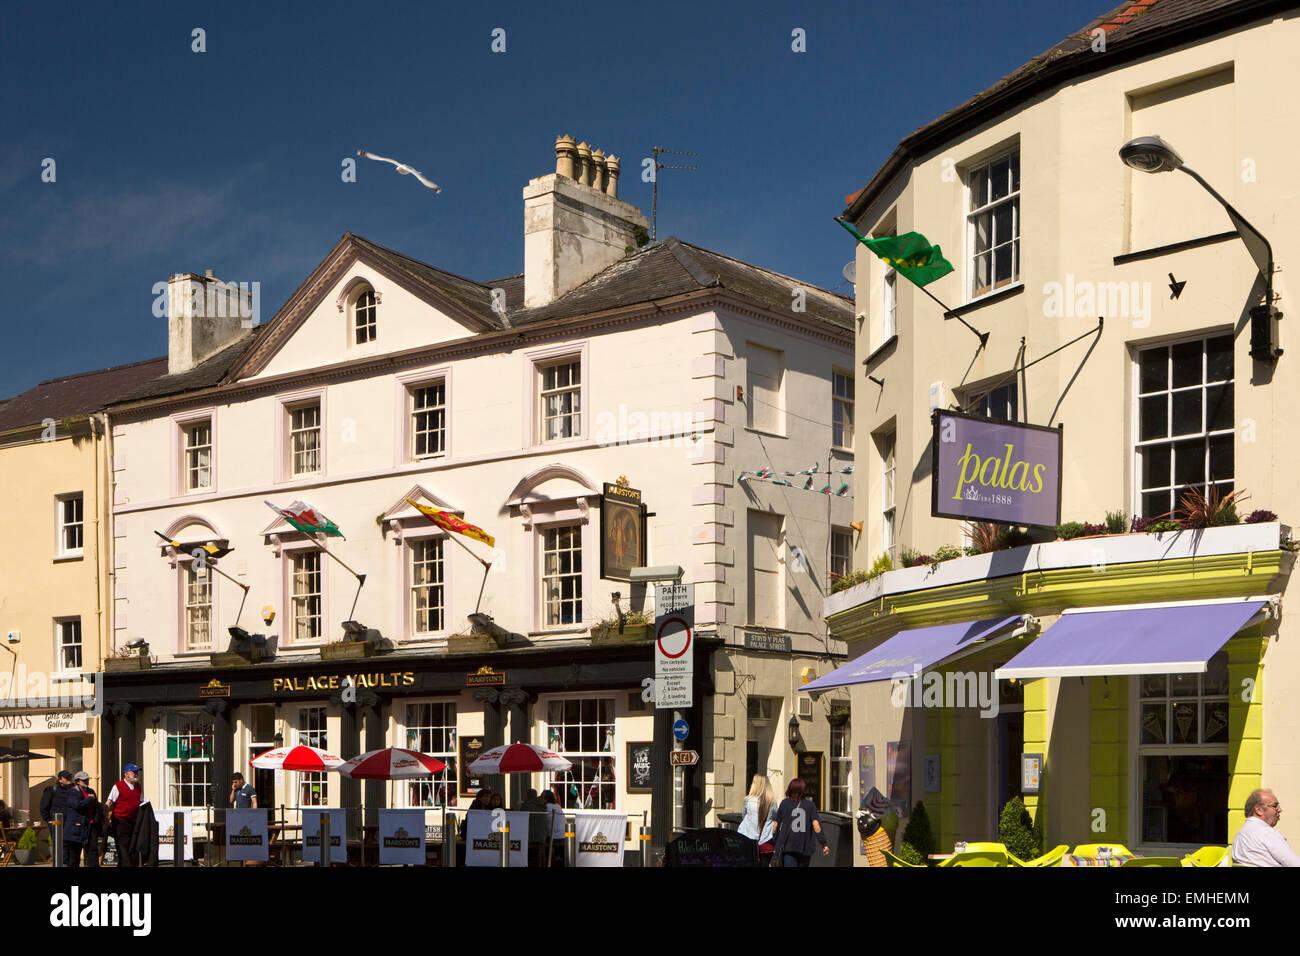 UK, Wales, Gwynedd, Caernarfon, Pen Deitsh, Palace Vaults Pub - Stock Image